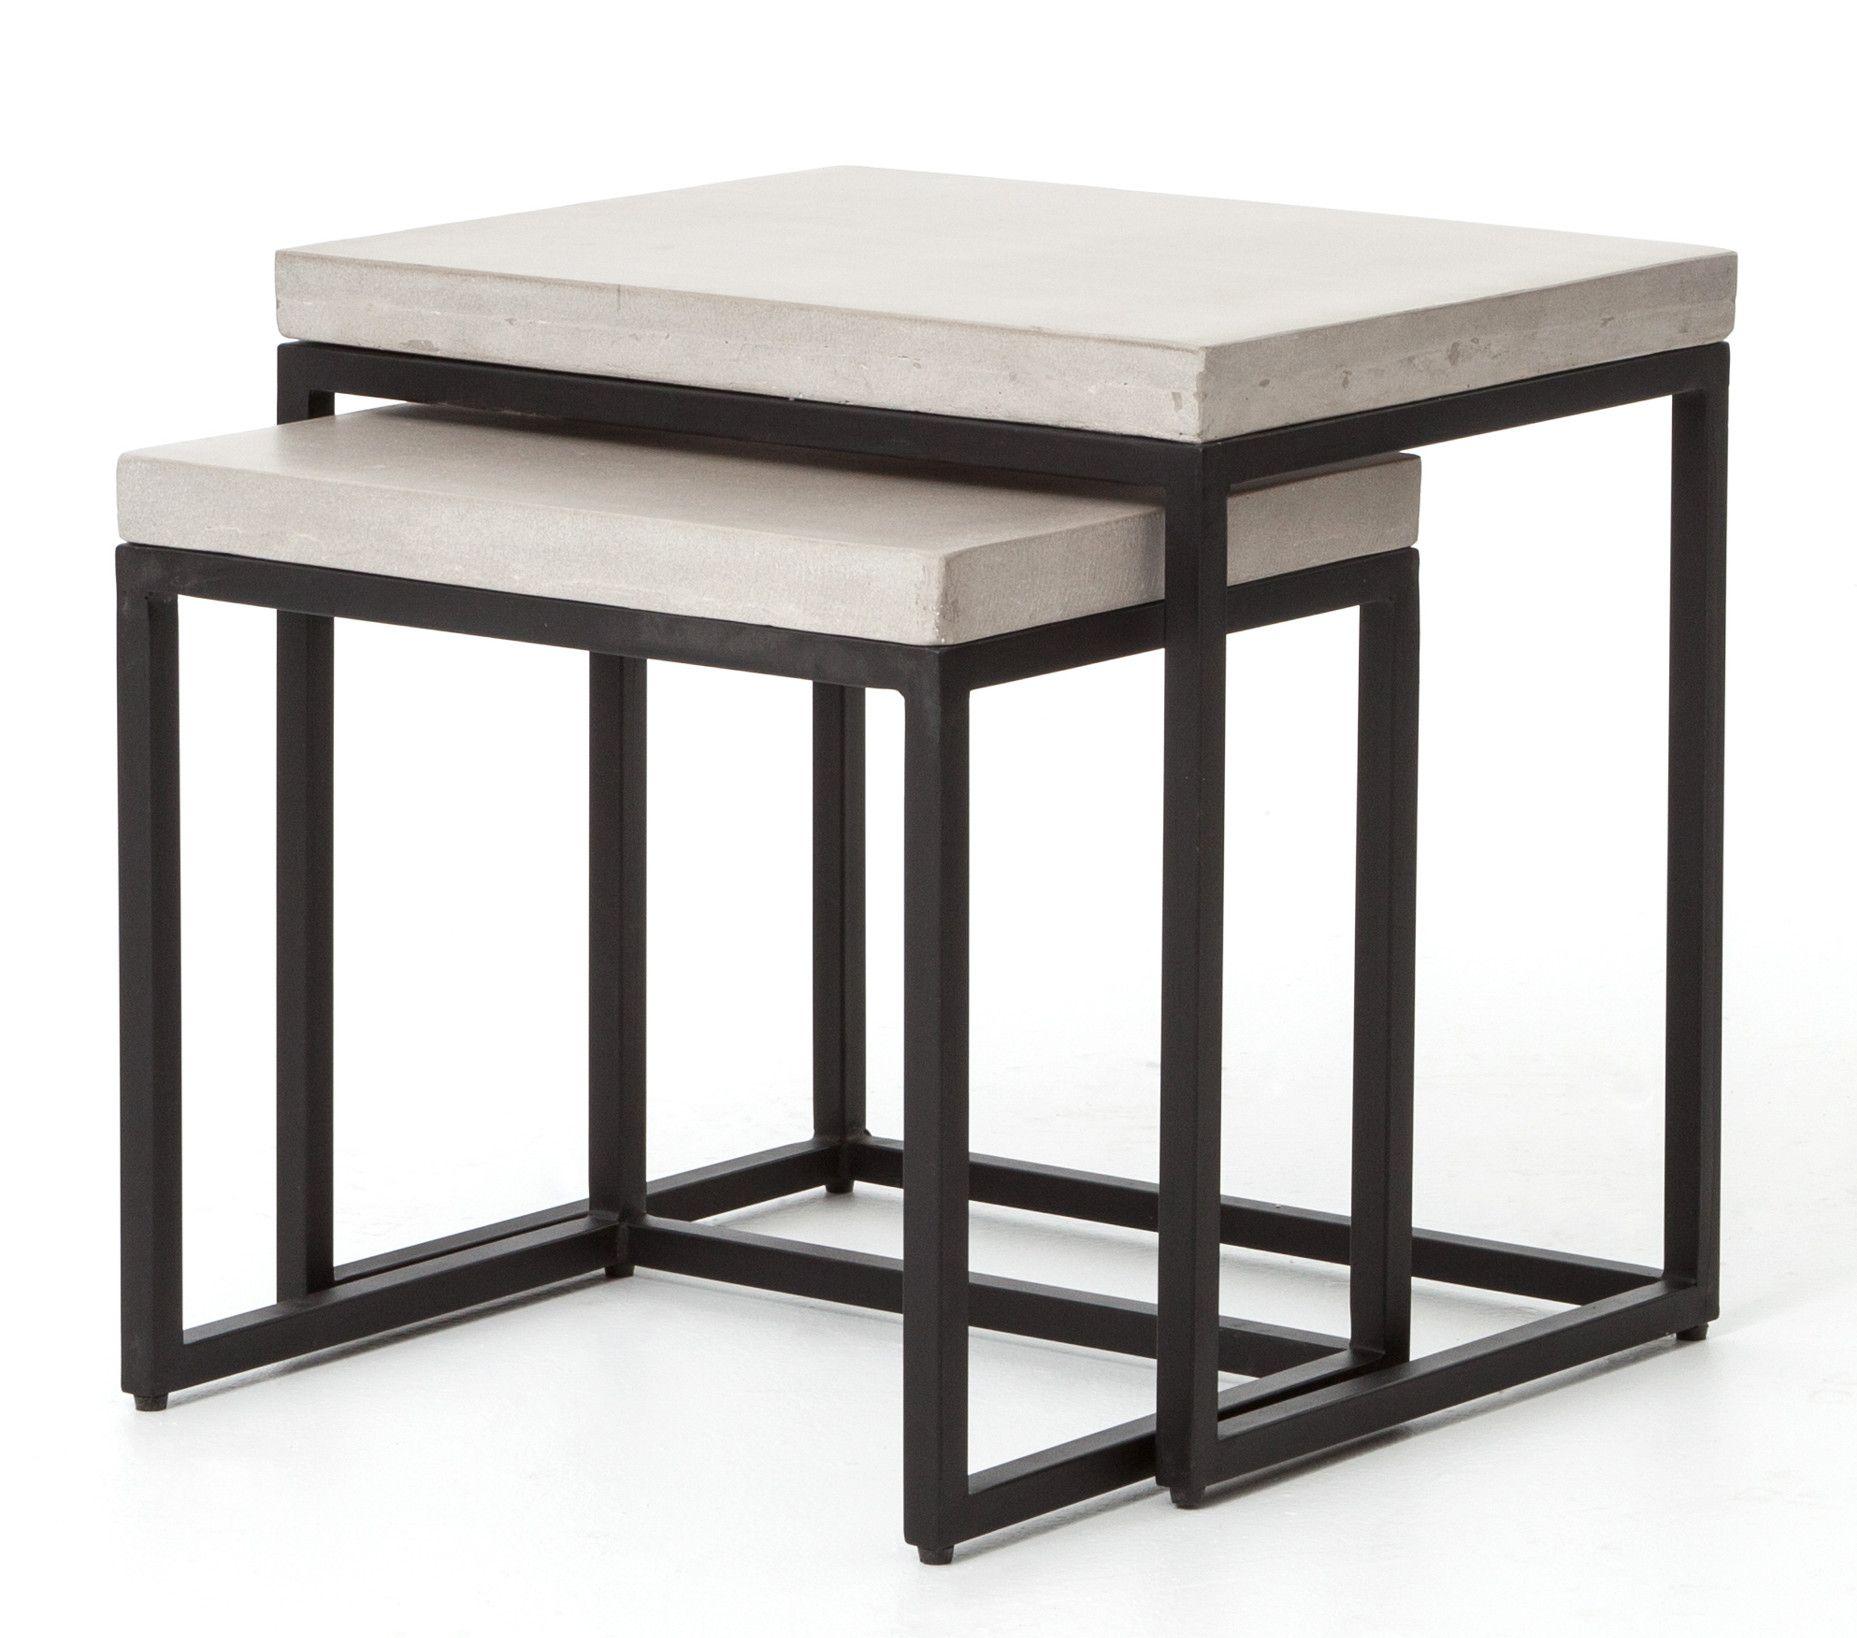 Maximus 2 Piece Nesting Tables Wayfair Coffee Table Table